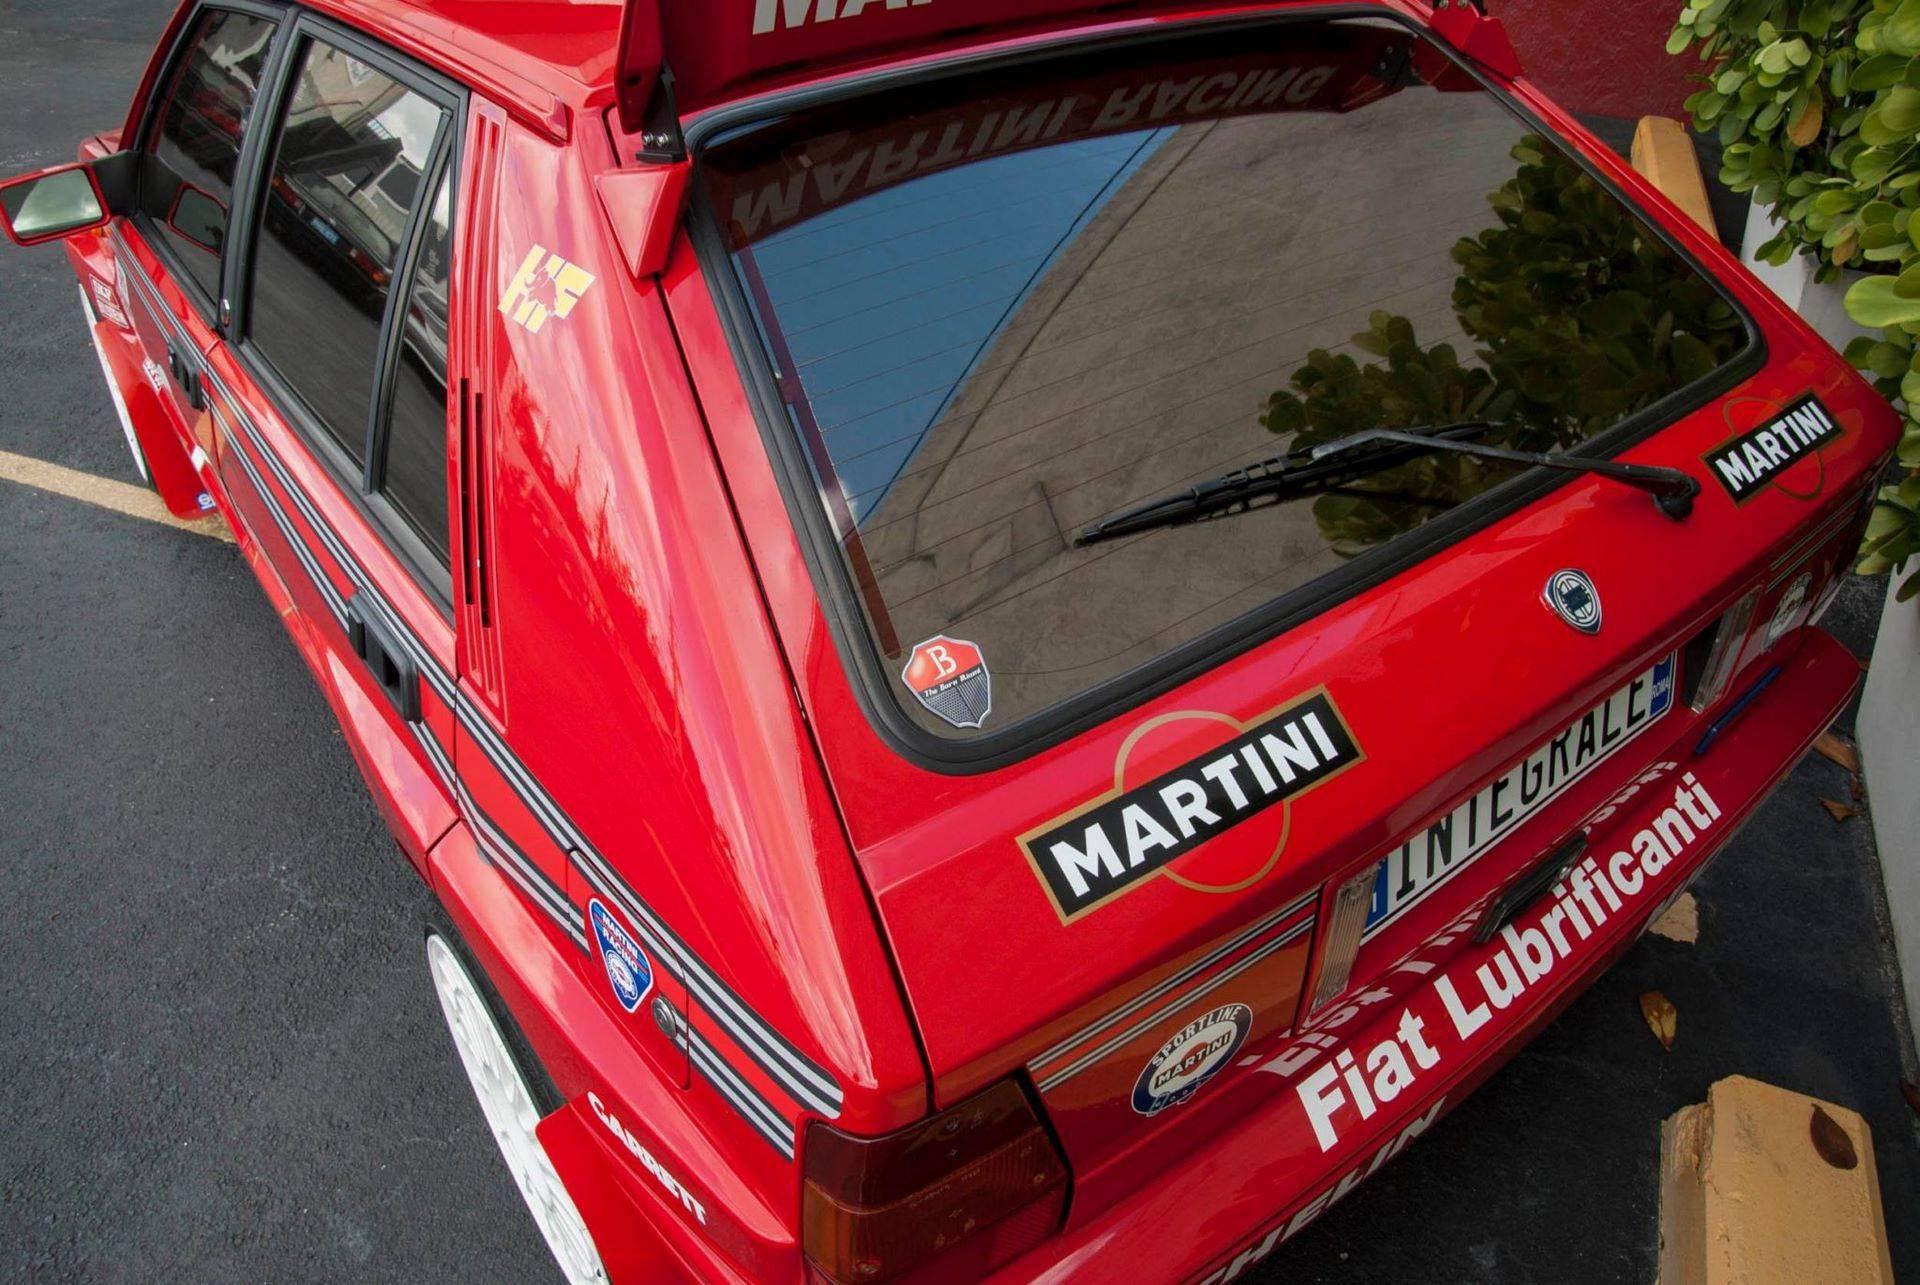 Lancia-Delta-Integrale-8V-1989-57